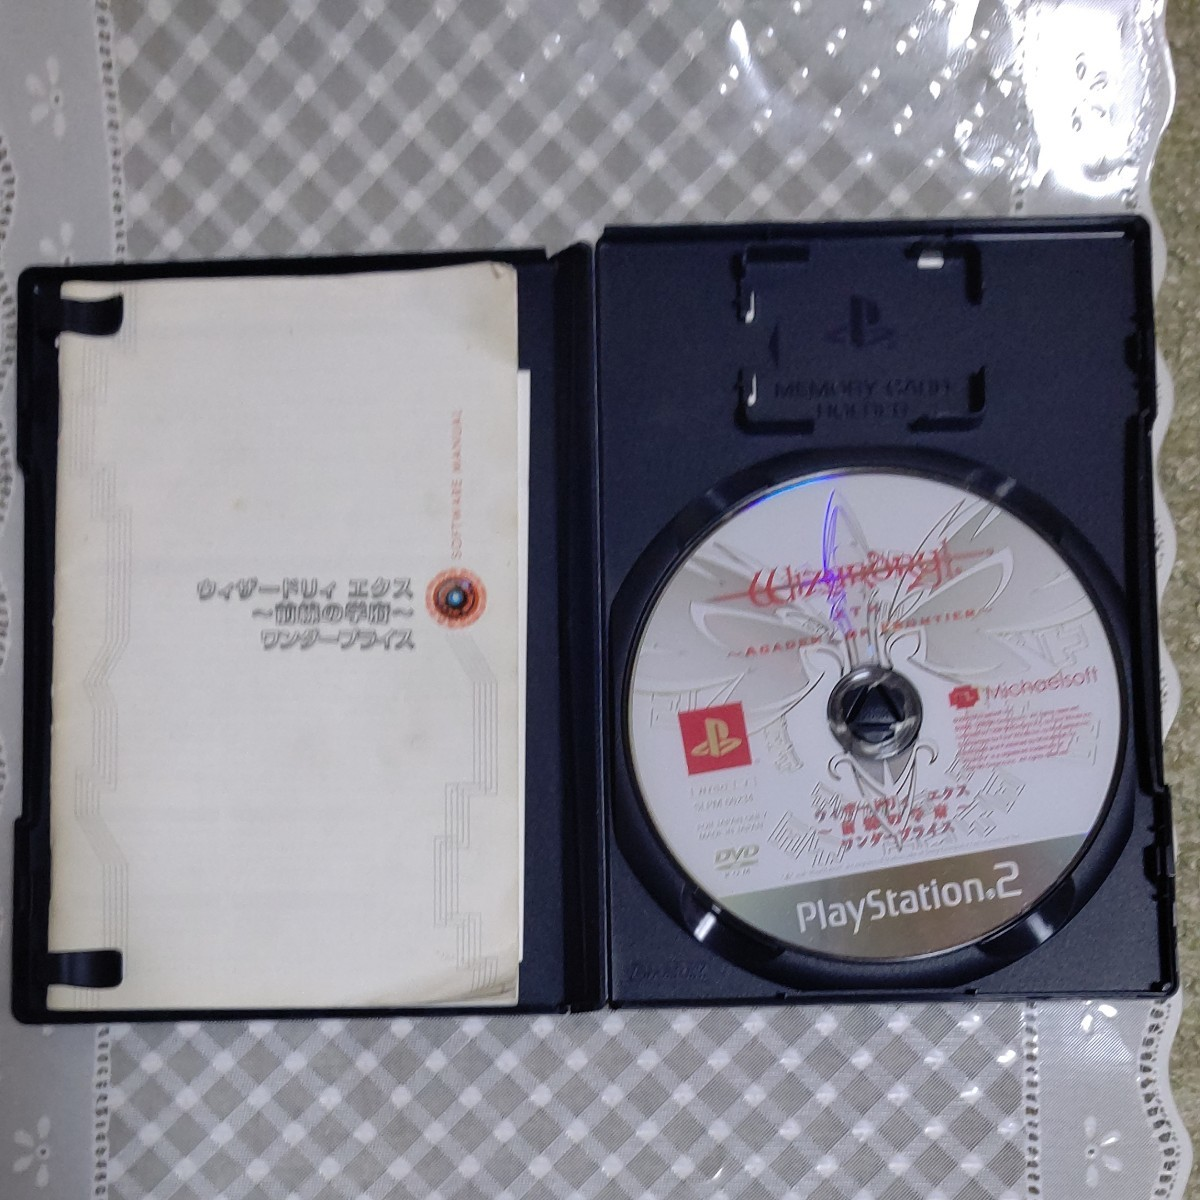 PS2 プレイステーション2 ソフト ウィザードリィエクス前線の学府